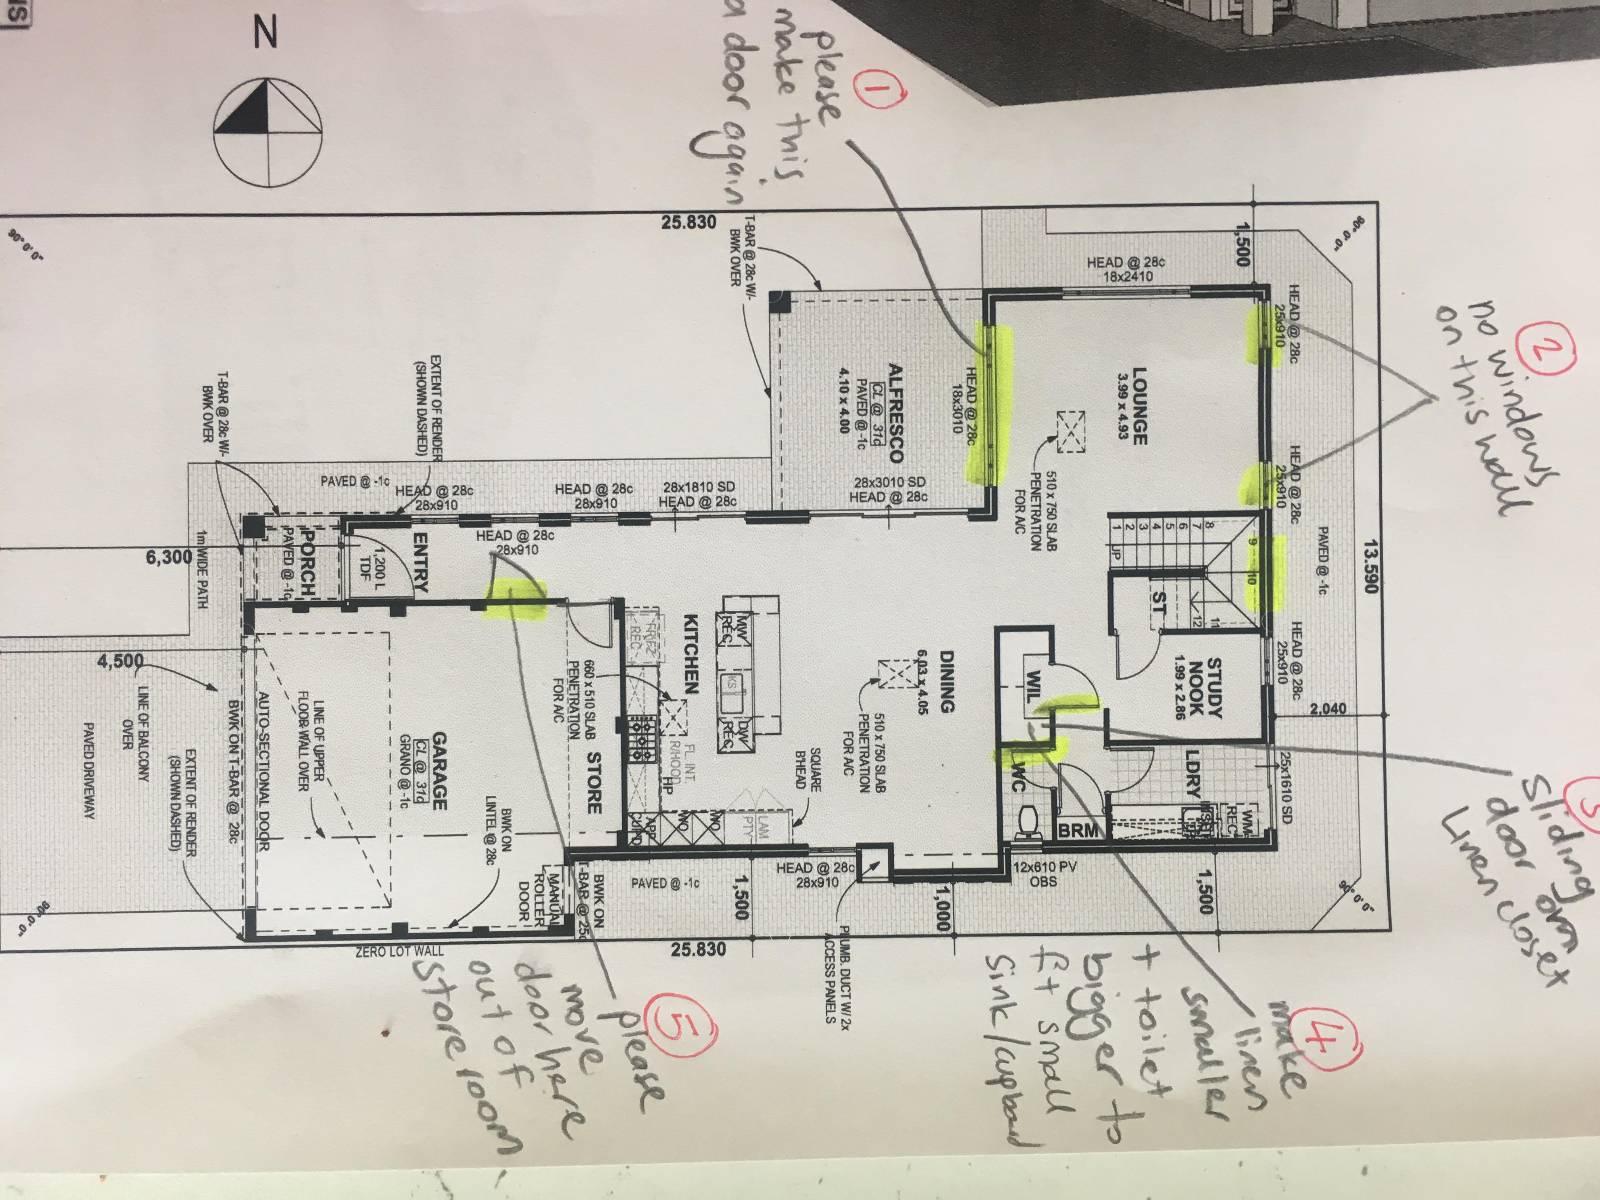 View: Seeking feedback for house design